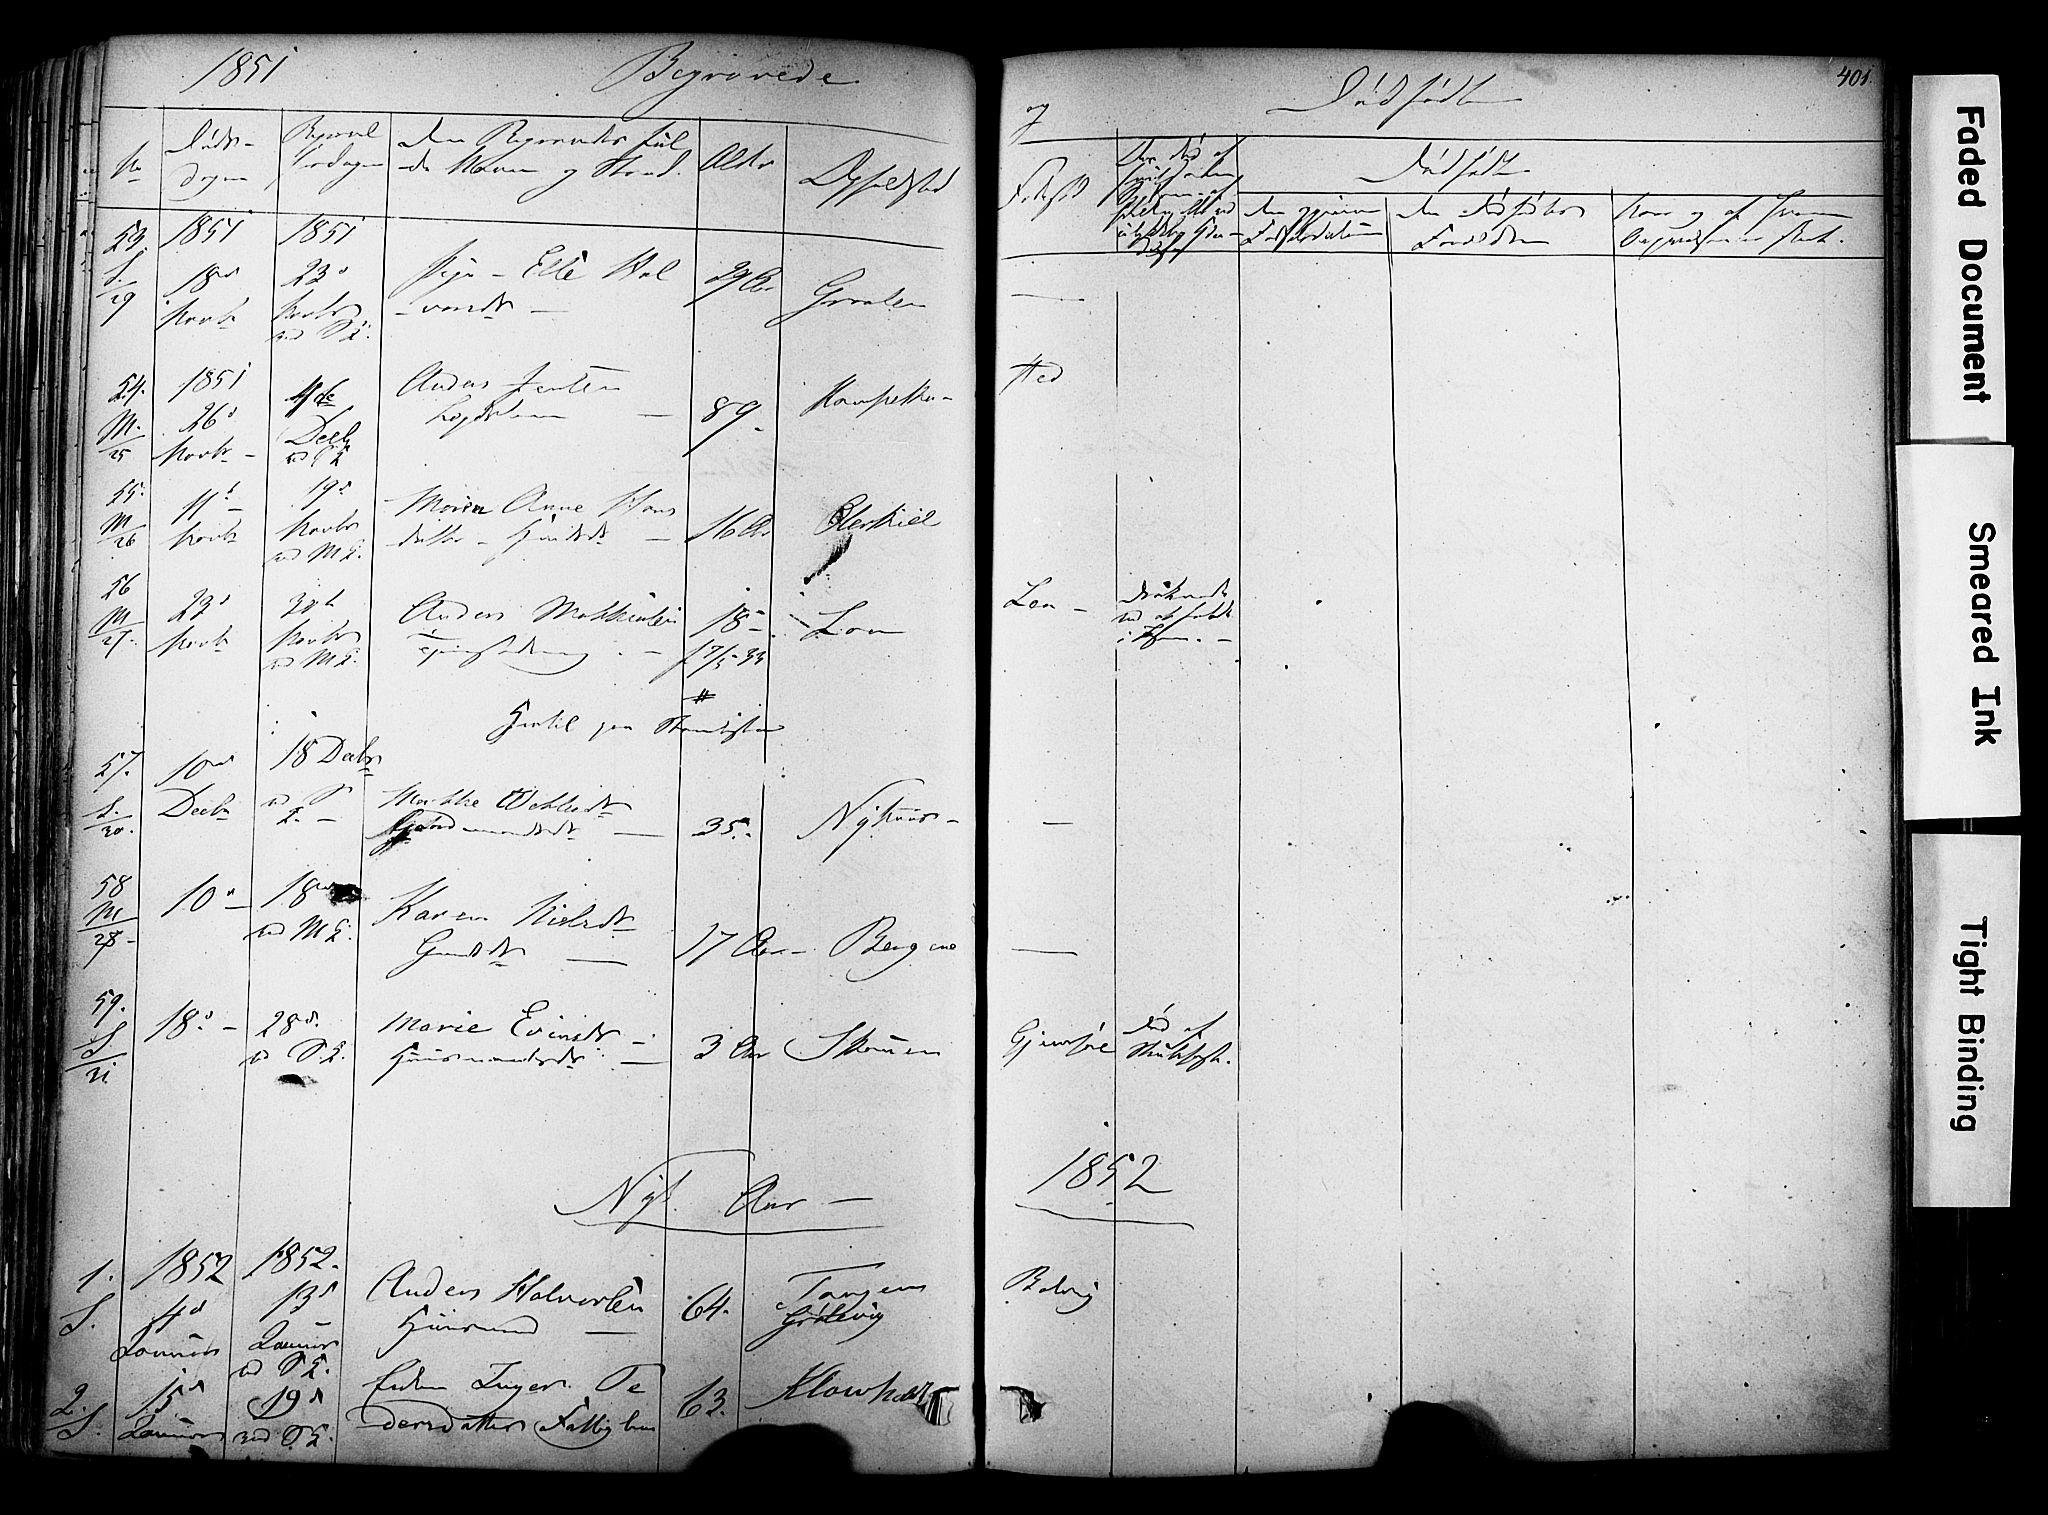 SAKO, Solum kirkebøker, F/Fa/L0006: Ministerialbok nr. I 6, 1844-1855, s. 401